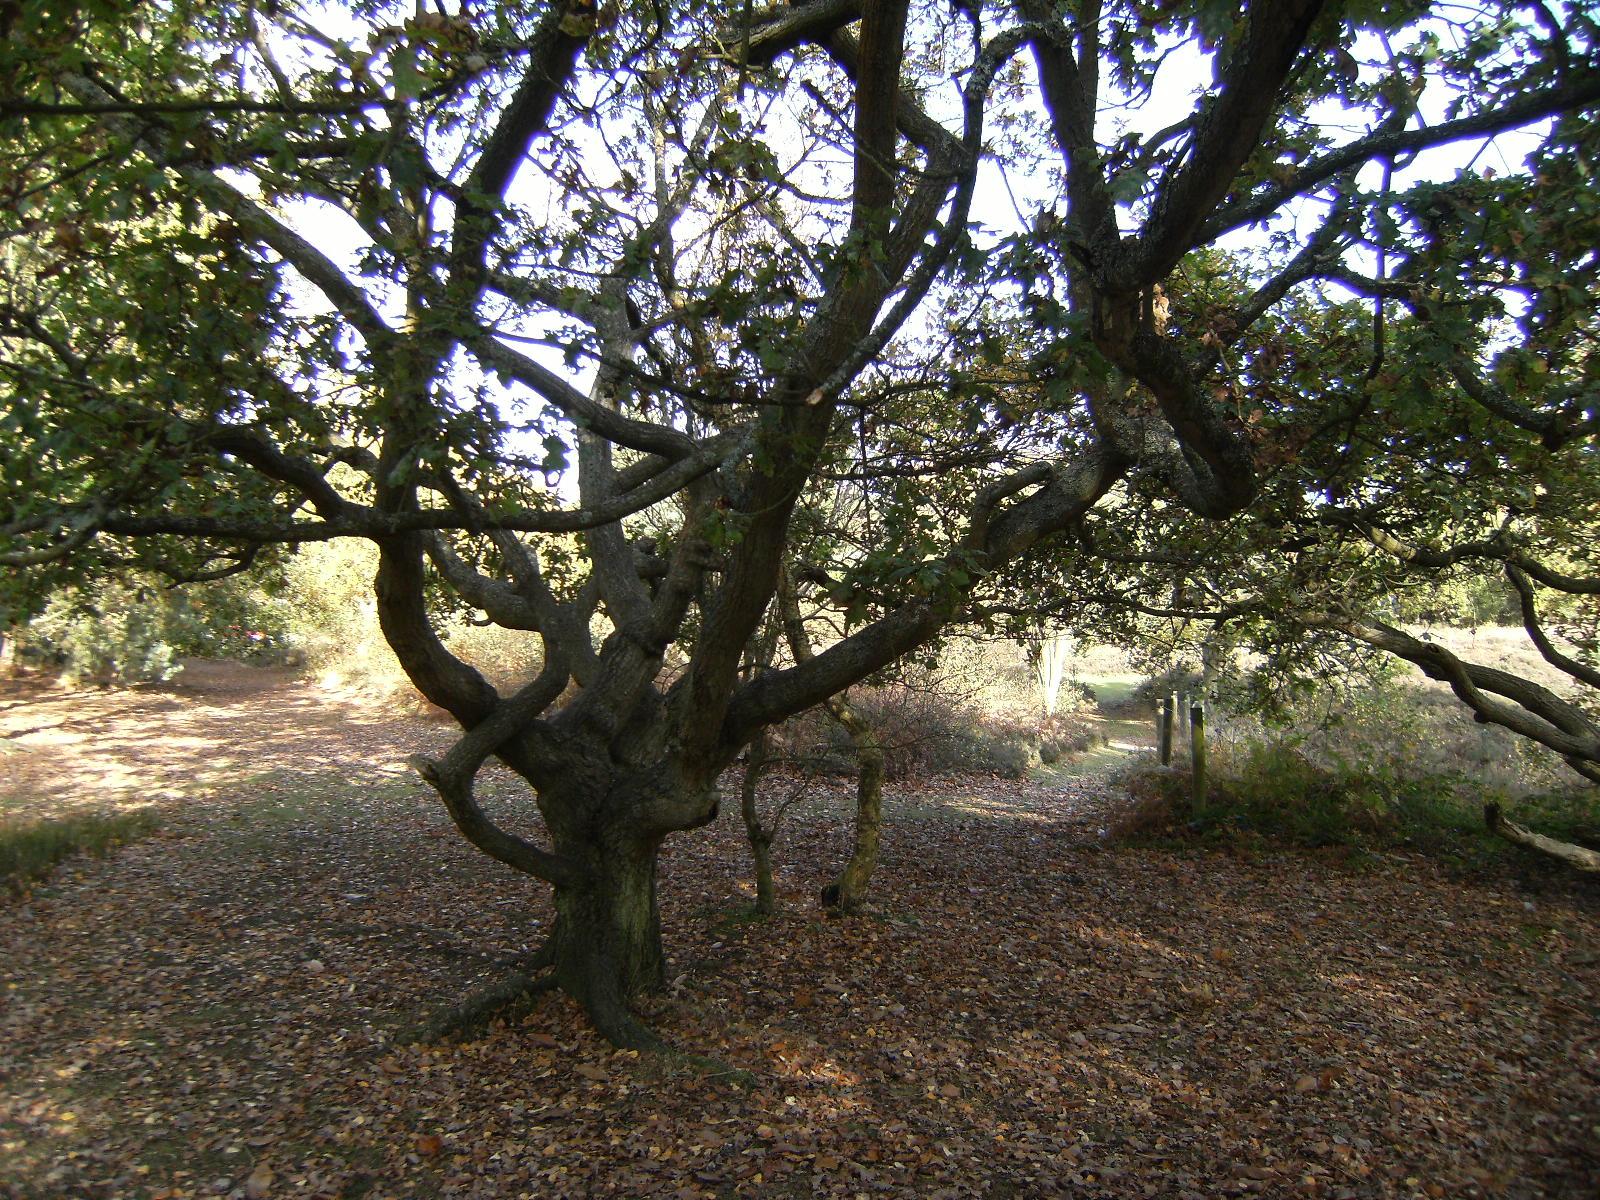 DSCF2351 Gnarled tree on Finchampstead Ridges